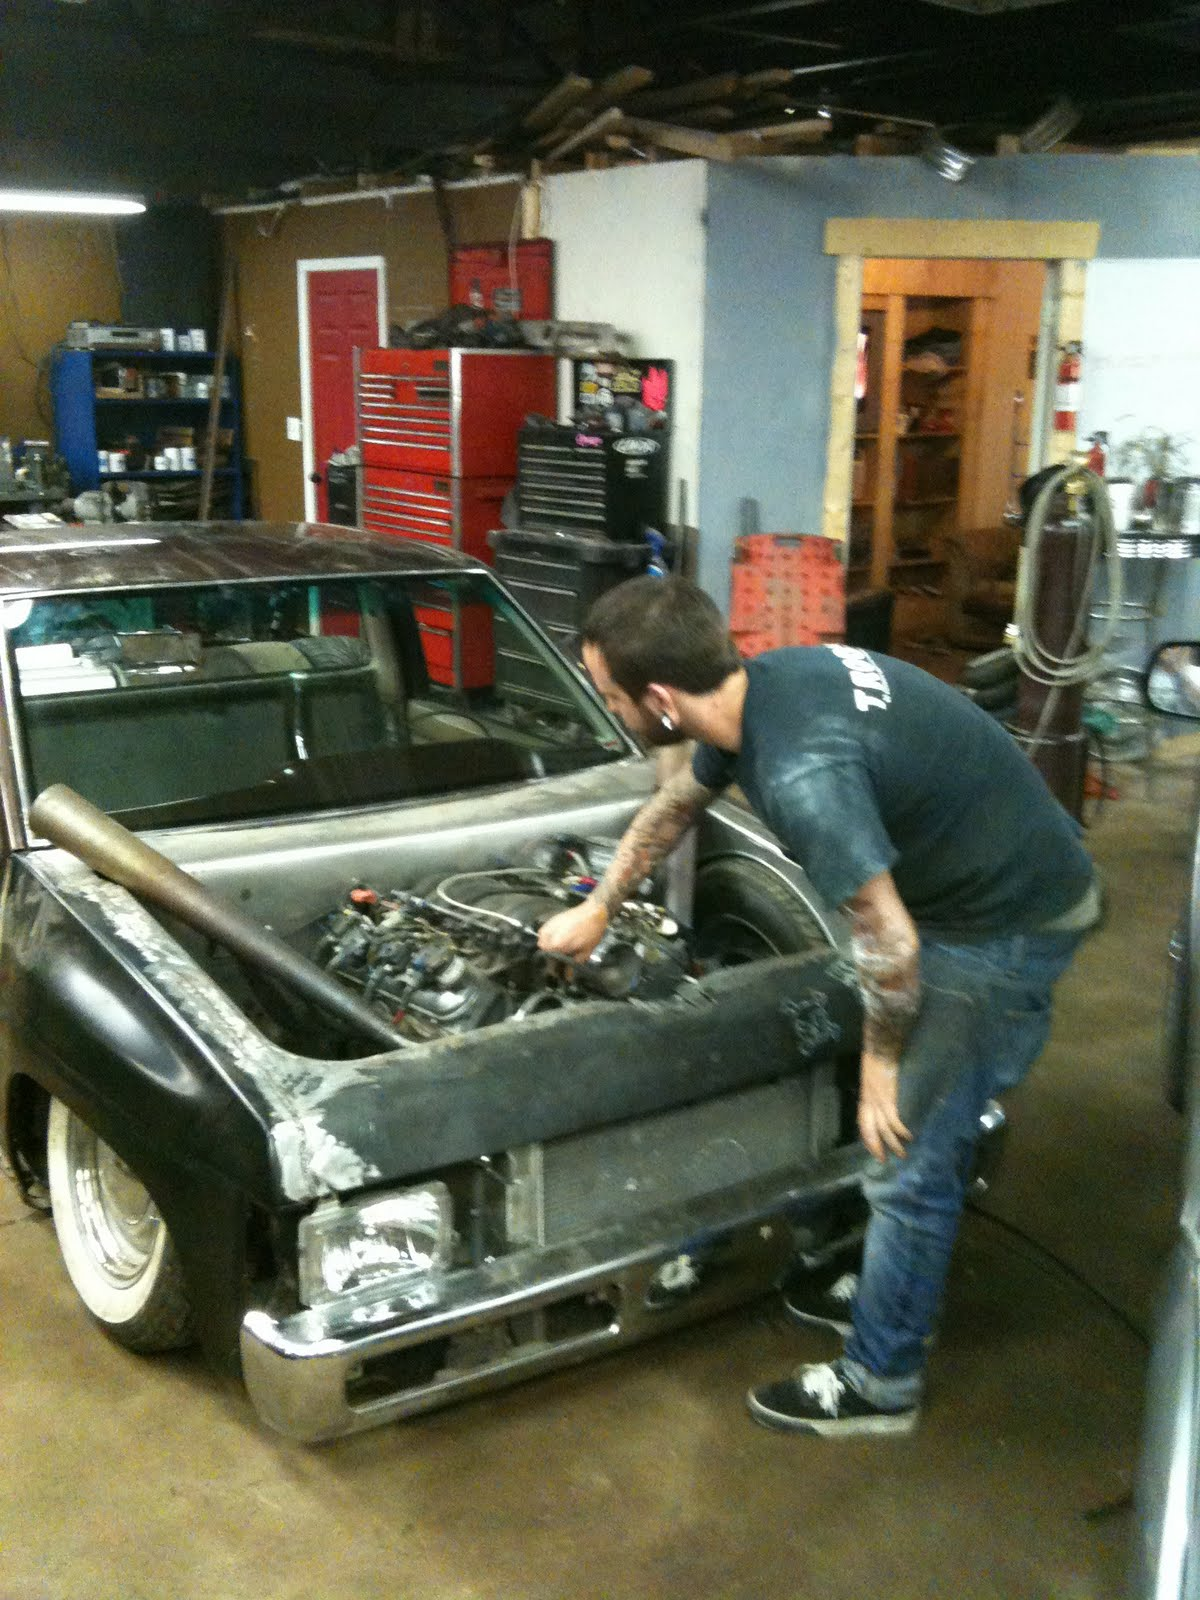 Kansas City S Full Service Auto Repair And Ls1 V8 Swap